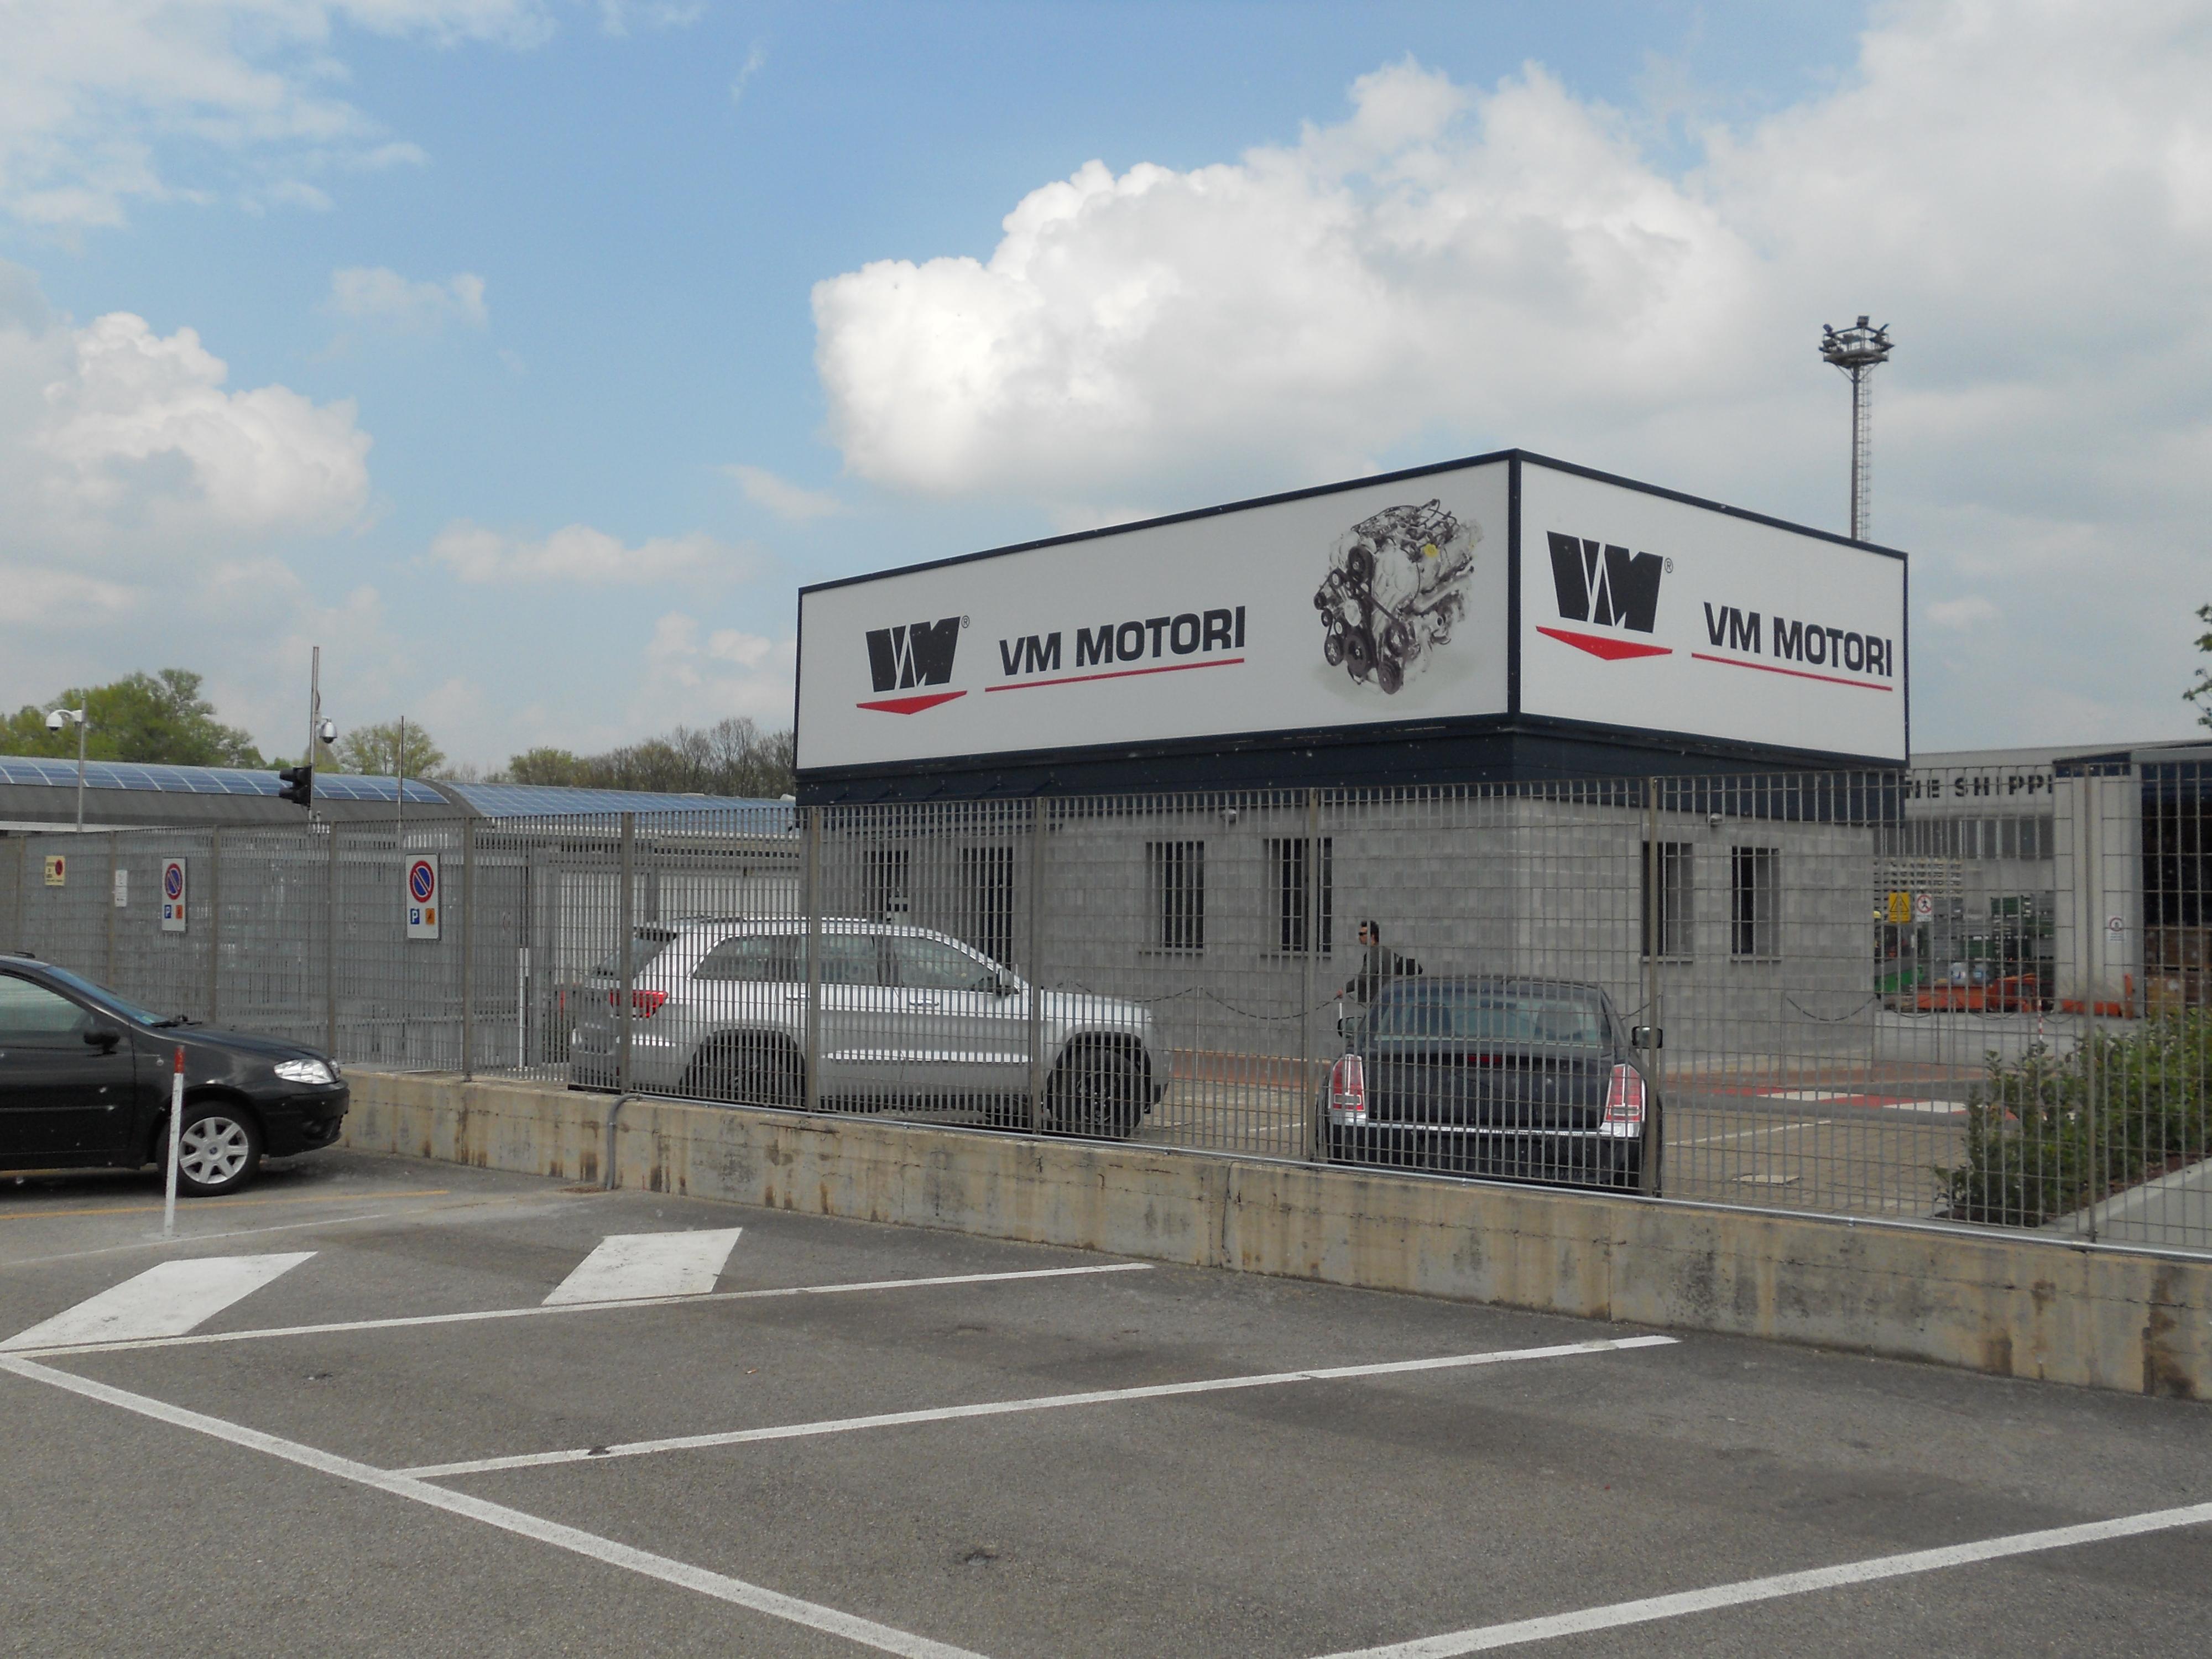 VM Motori - Wikipedia